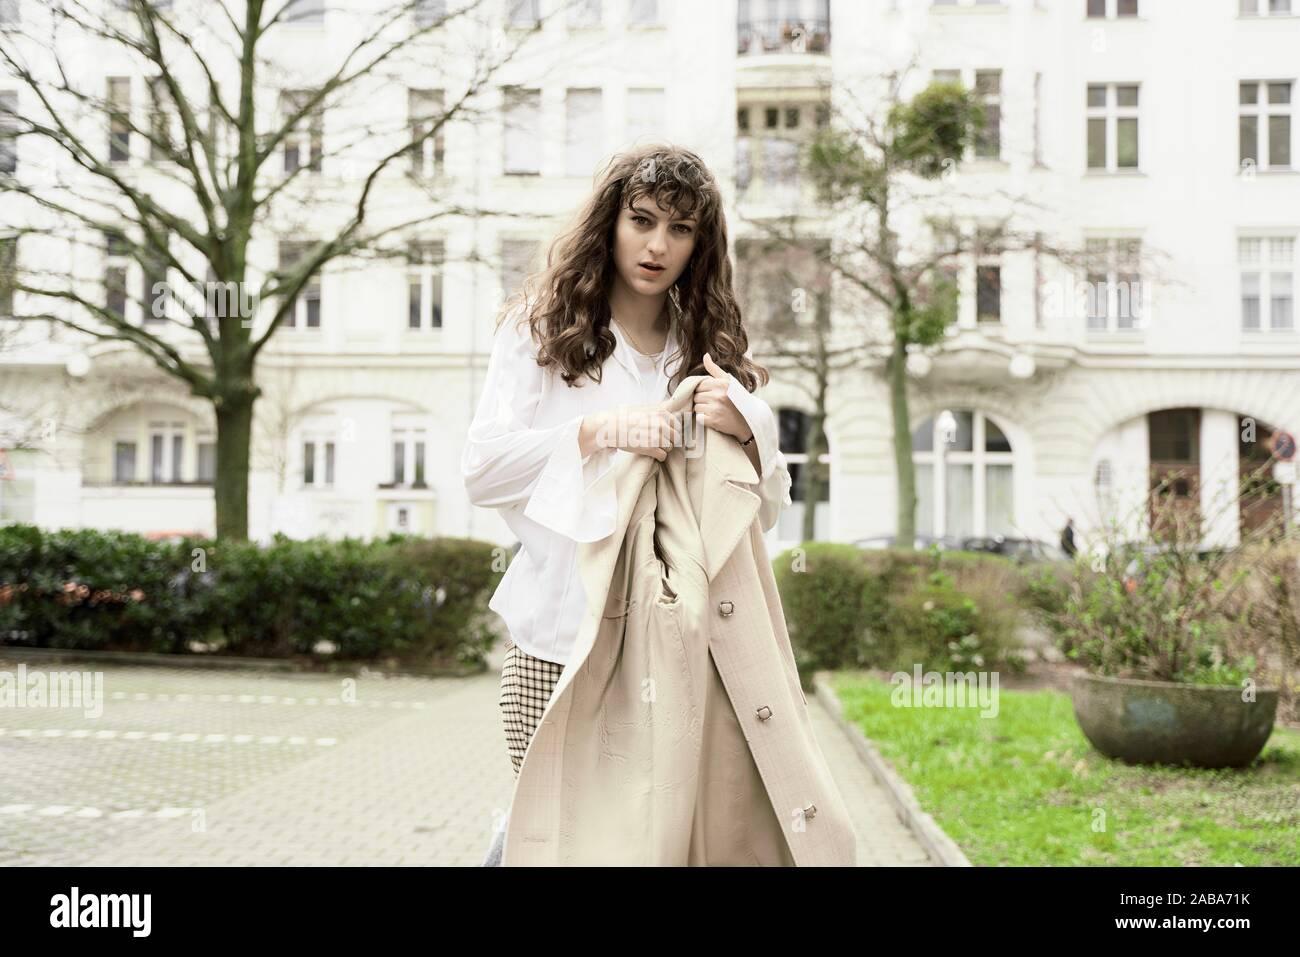 Junge Frau, in Berlin, Deutschland. Stockfoto